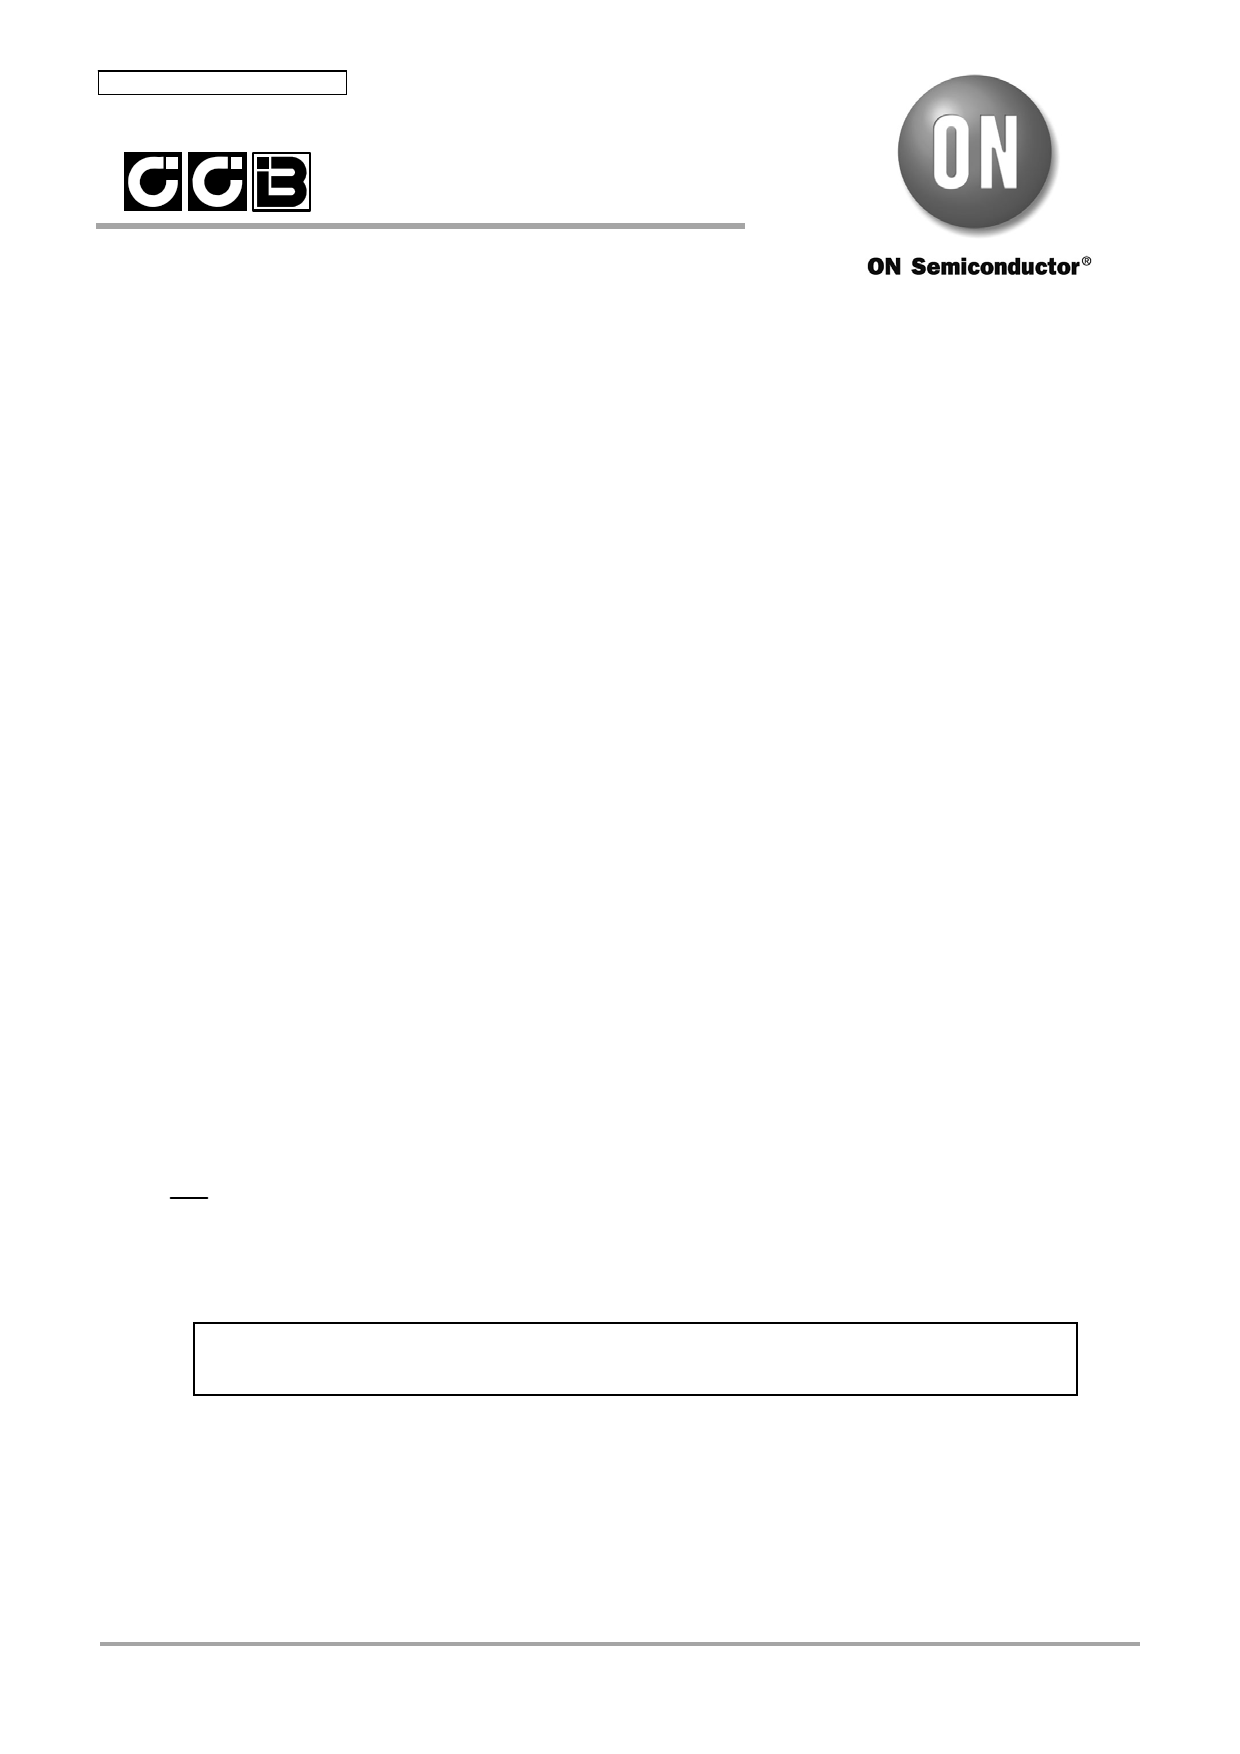 LC75812PT datasheet